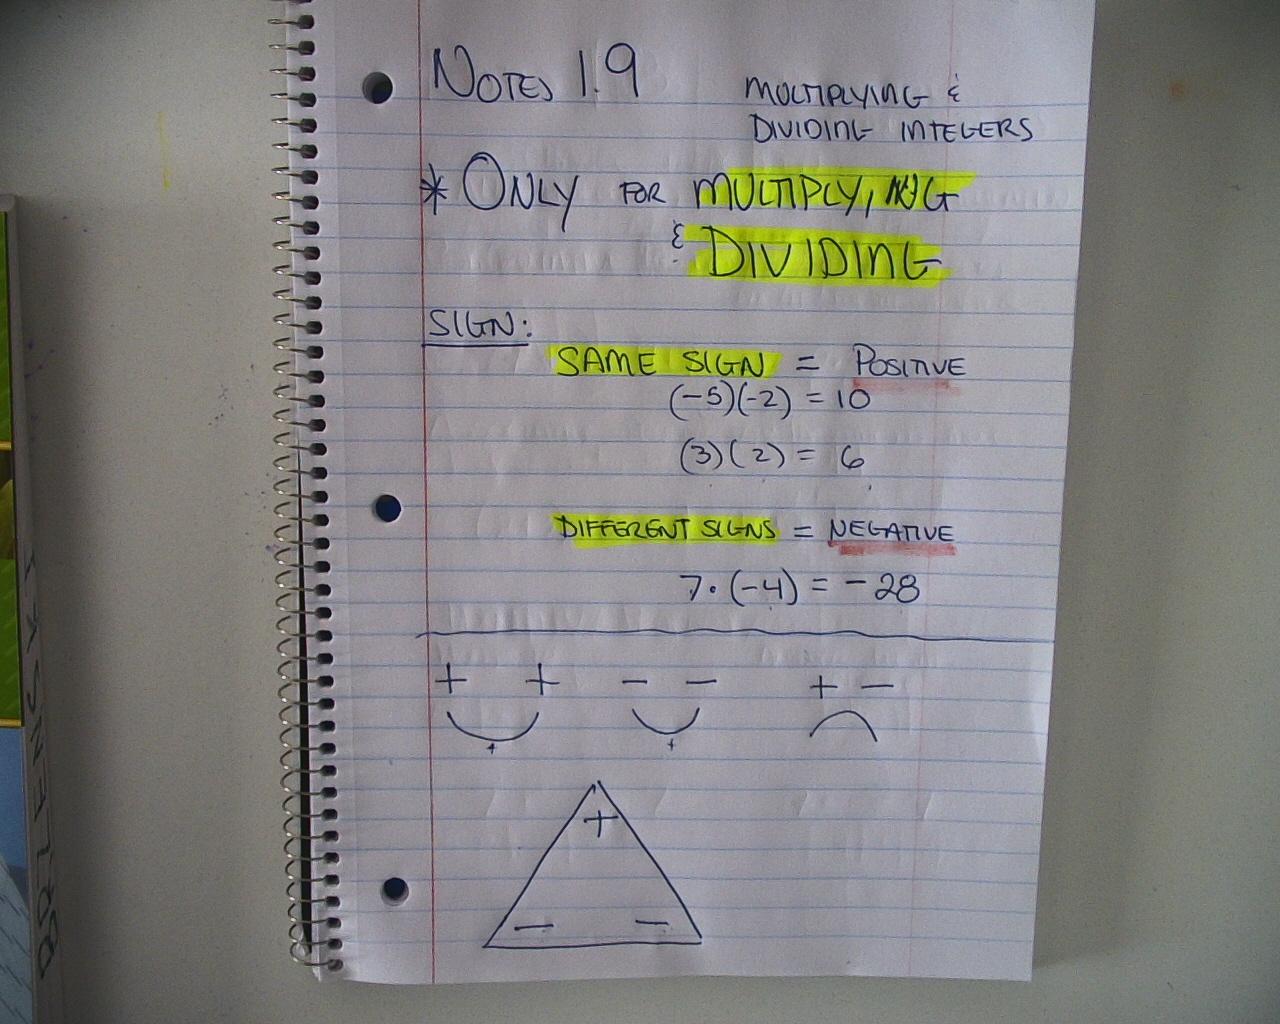 mr  brzenski u0026 39 s math class  notes 1 9 prealgebra notes 2 1